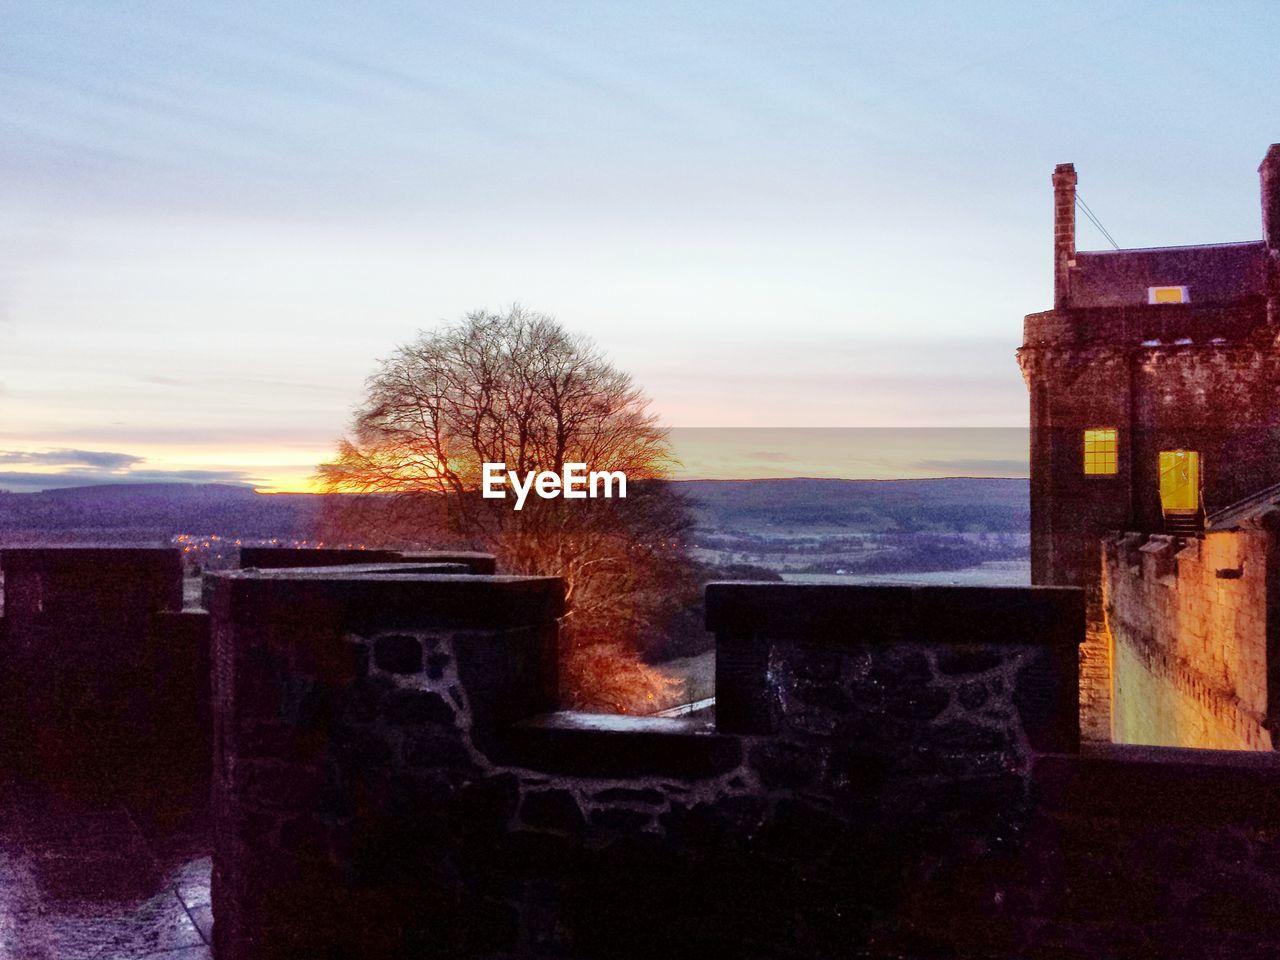 Stirling castle against sky during sunset